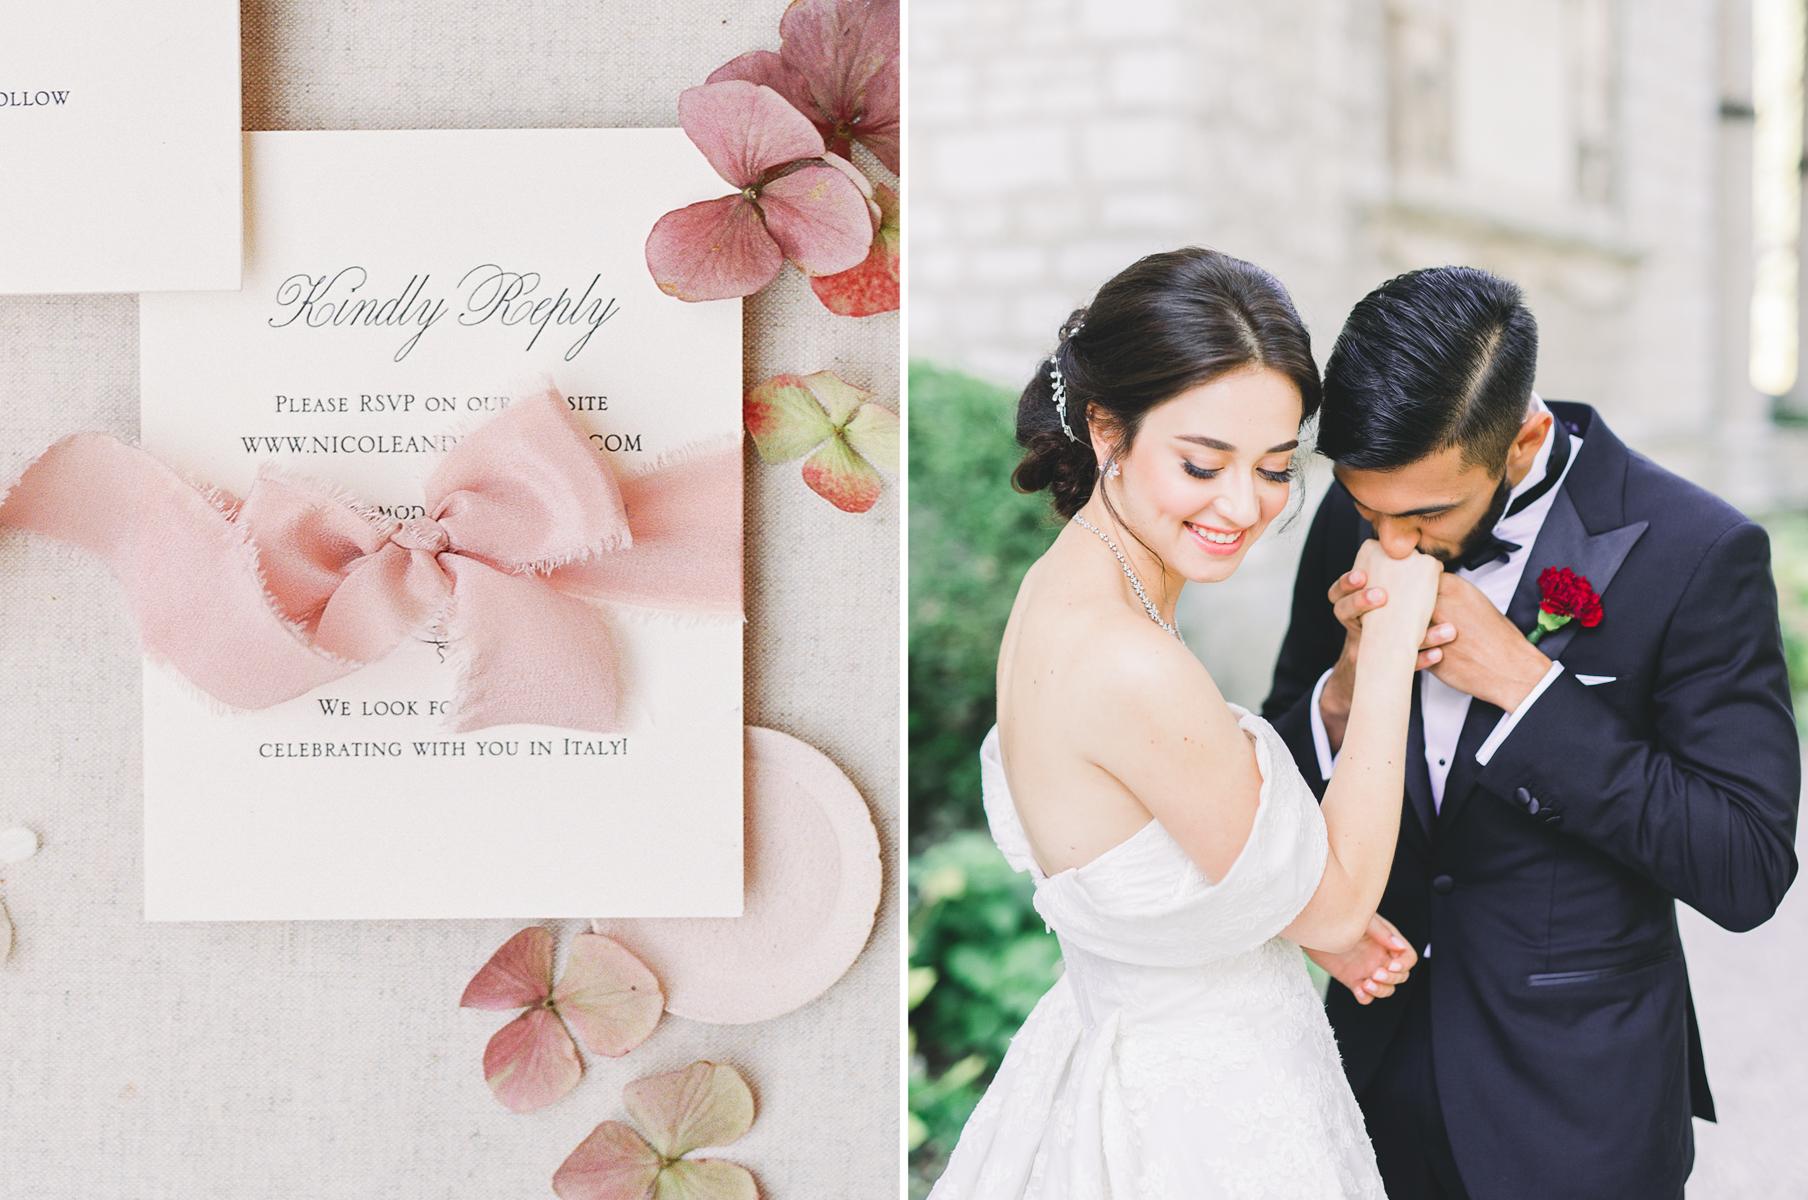 Palace_Villa_Cortine_Hotel_Italian_Wedding_Photographer_Sirmione_AKP-14-Nicole_Khudoyan_Mitchell_Kapoor.jpg